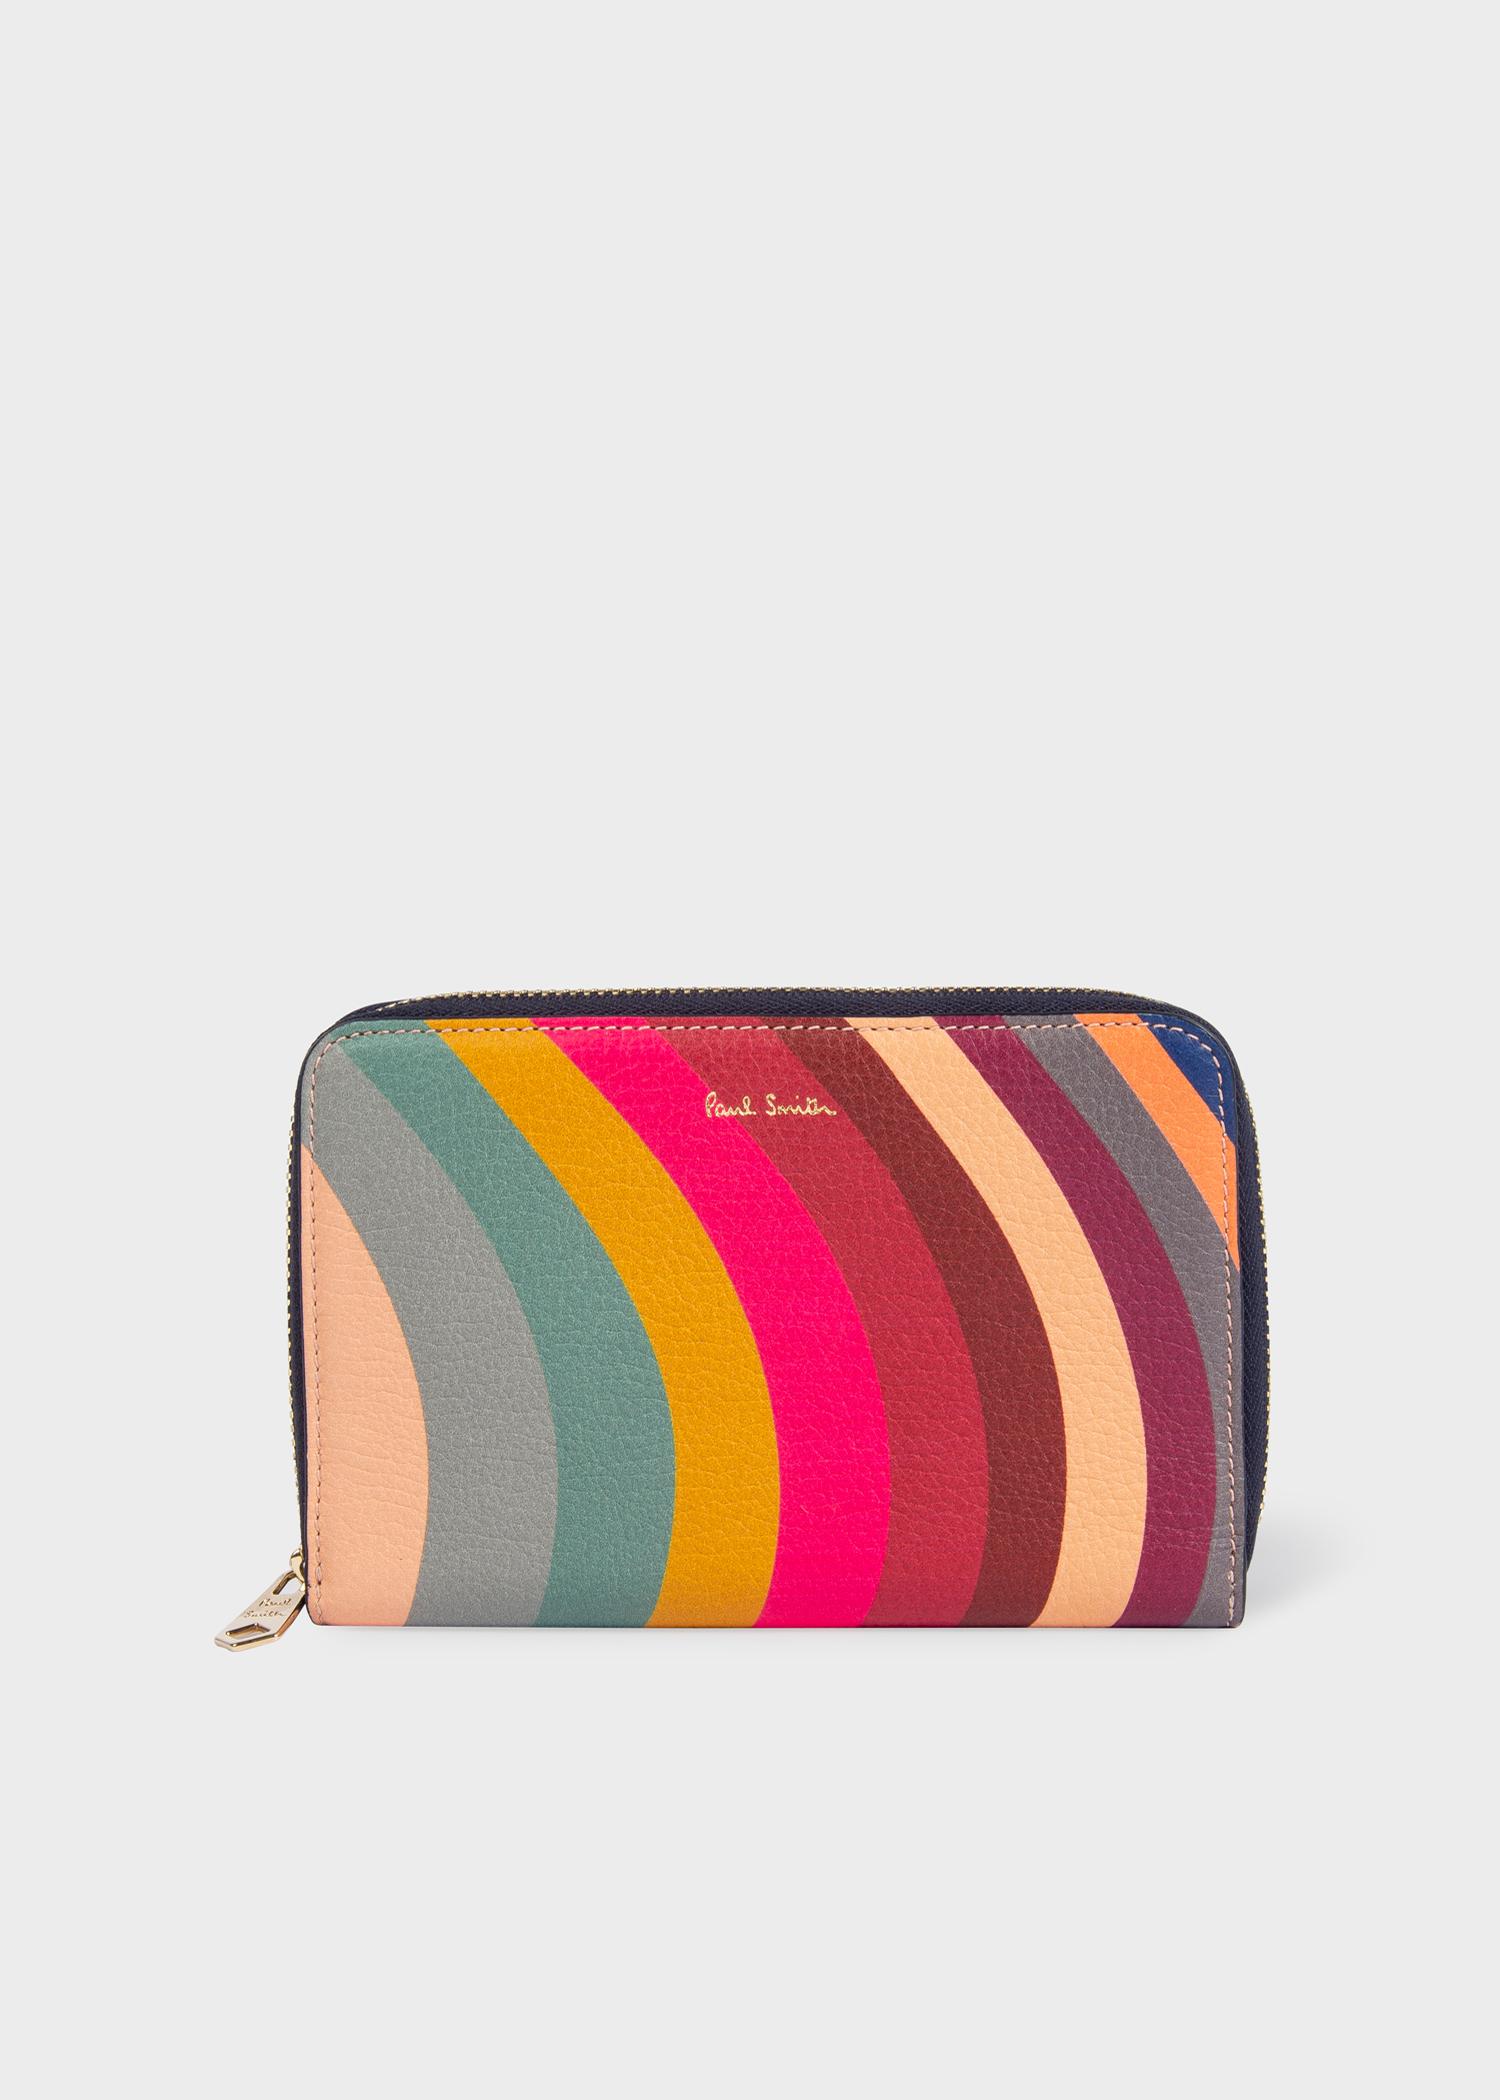 7149e1e84439 Women s Medium  Swirl  Print Leather Zip-Around Purse - Paul Smith US